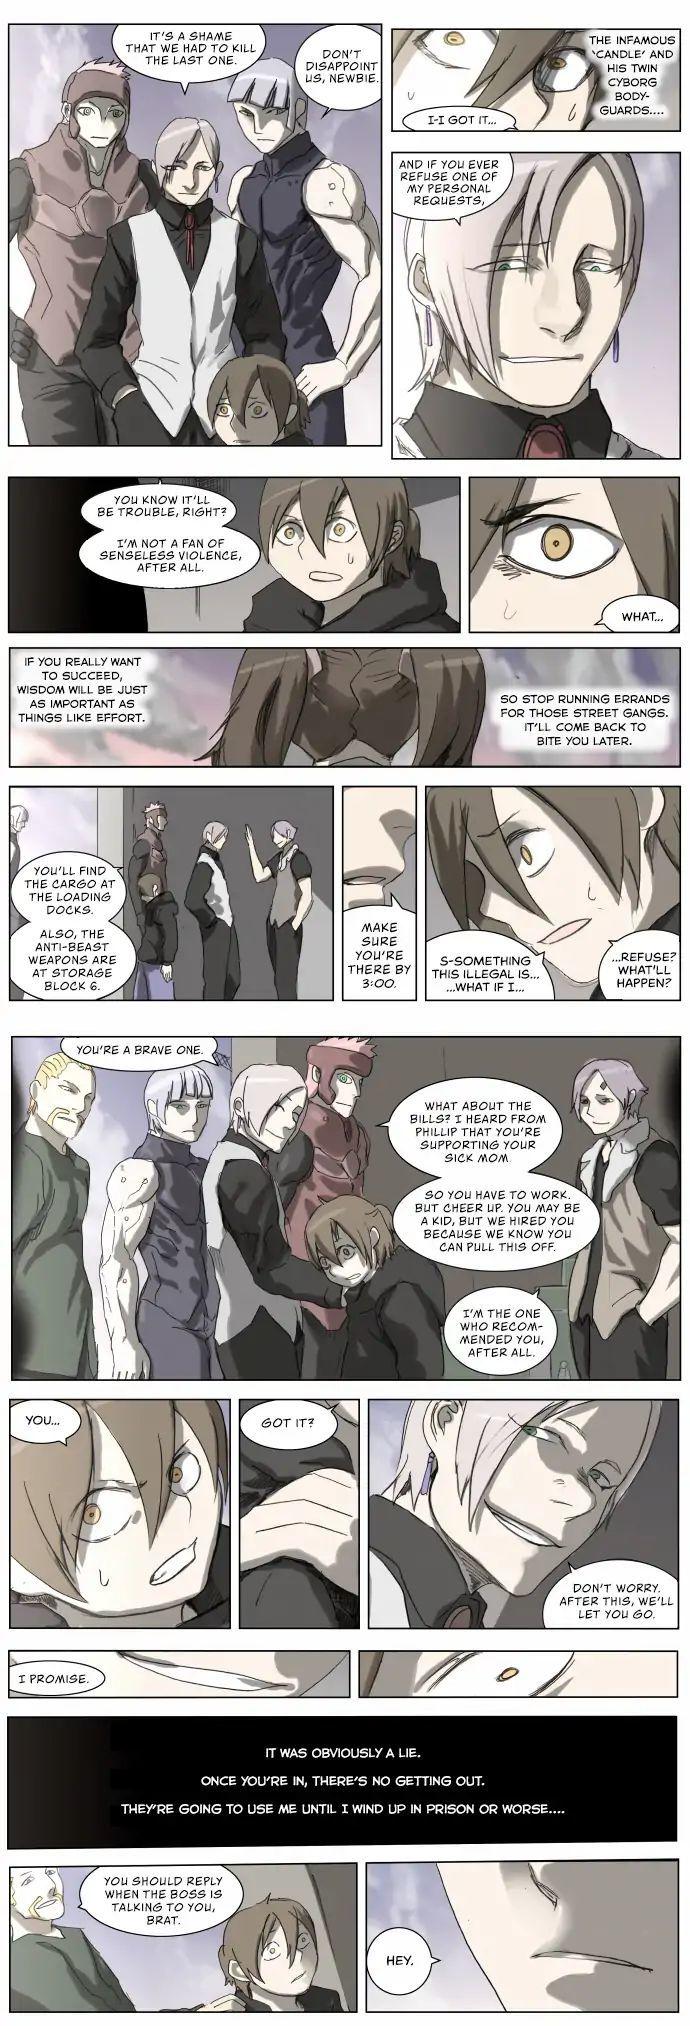 Knight Run 180 Page 1